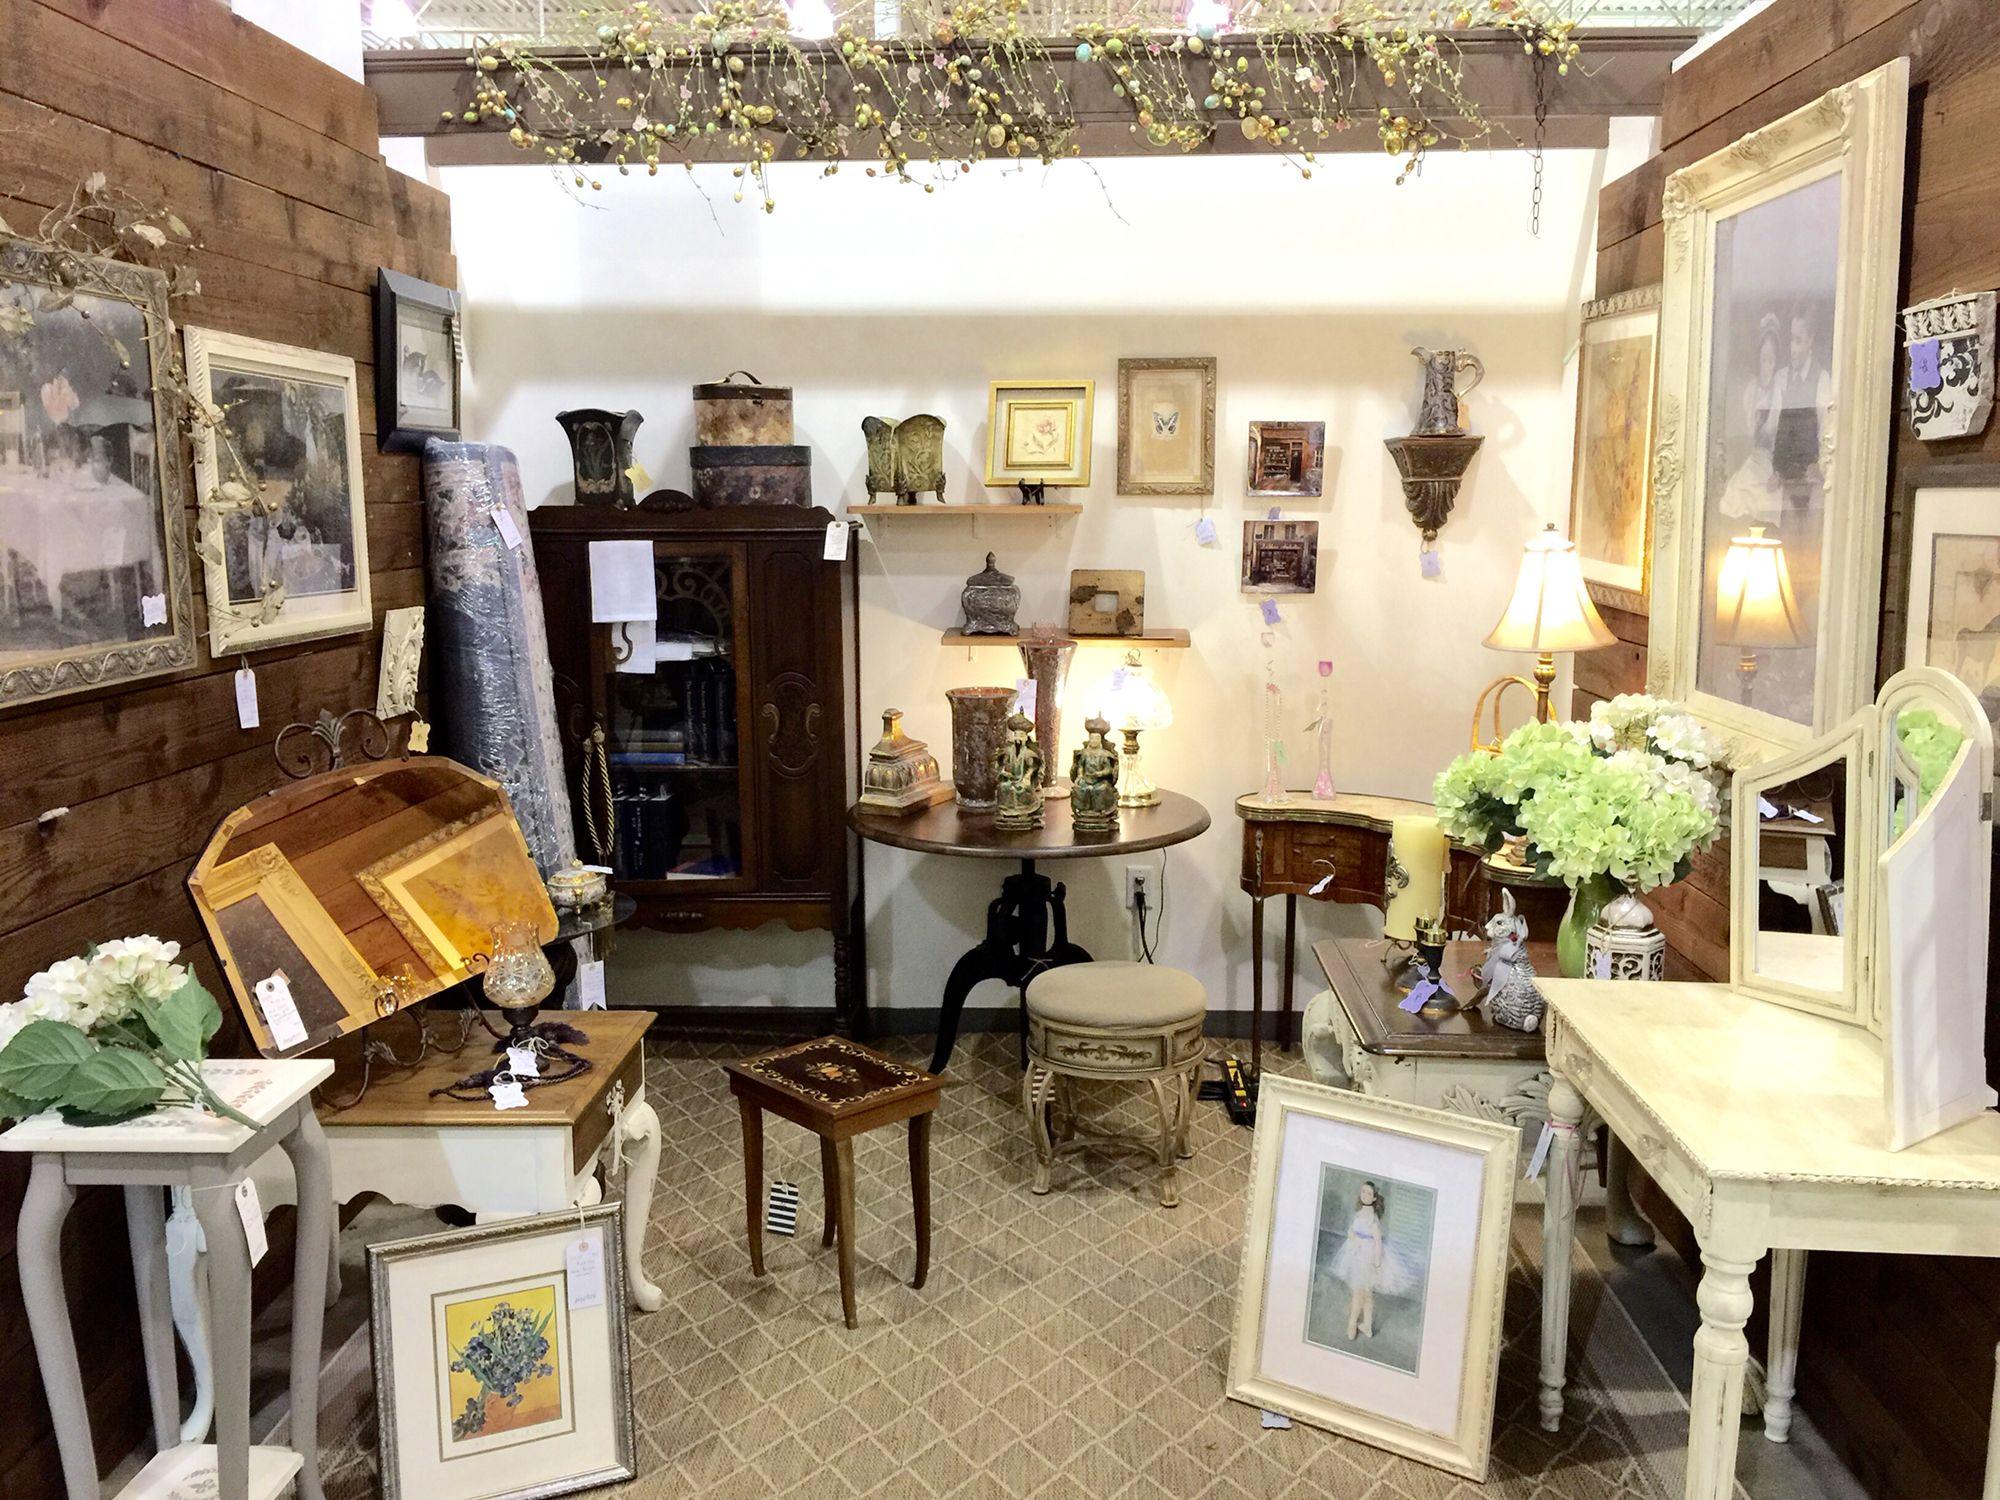 Studio B Antiques Frisco Mercantile #studiobantiques #friscomercantile